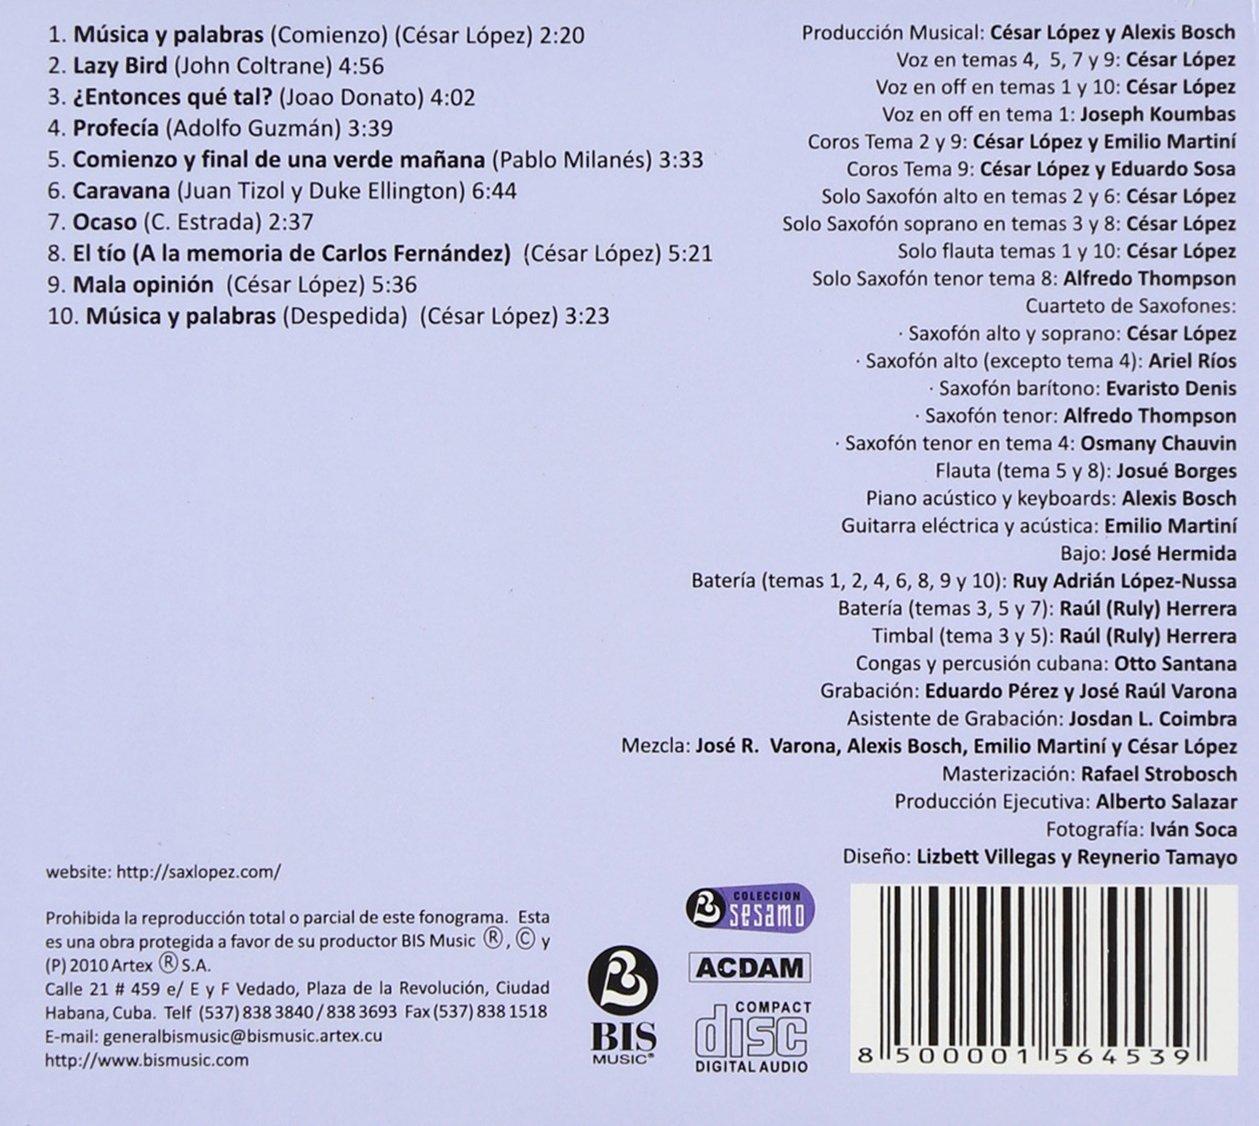 - CONTRASTES - Amazon.com Music